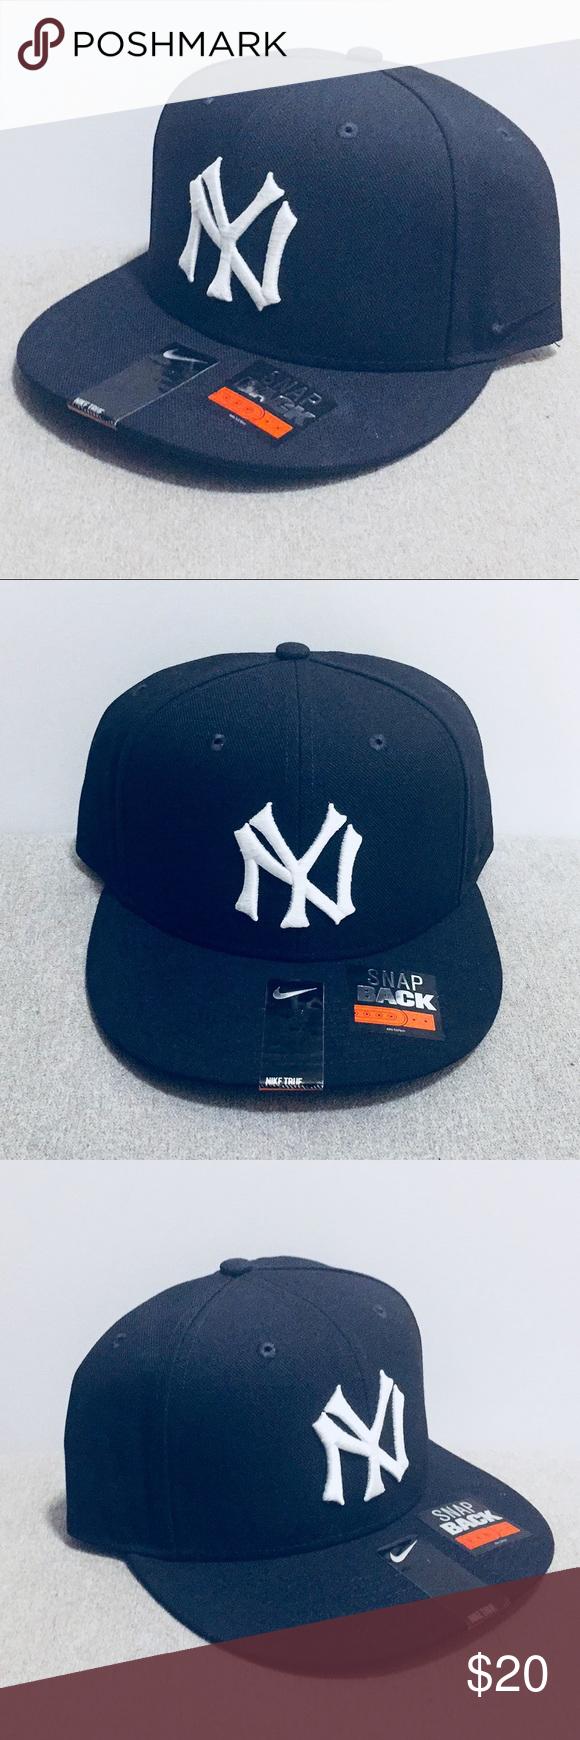 New York Yankees Snapback Clothes Design Fashion Design Fashion